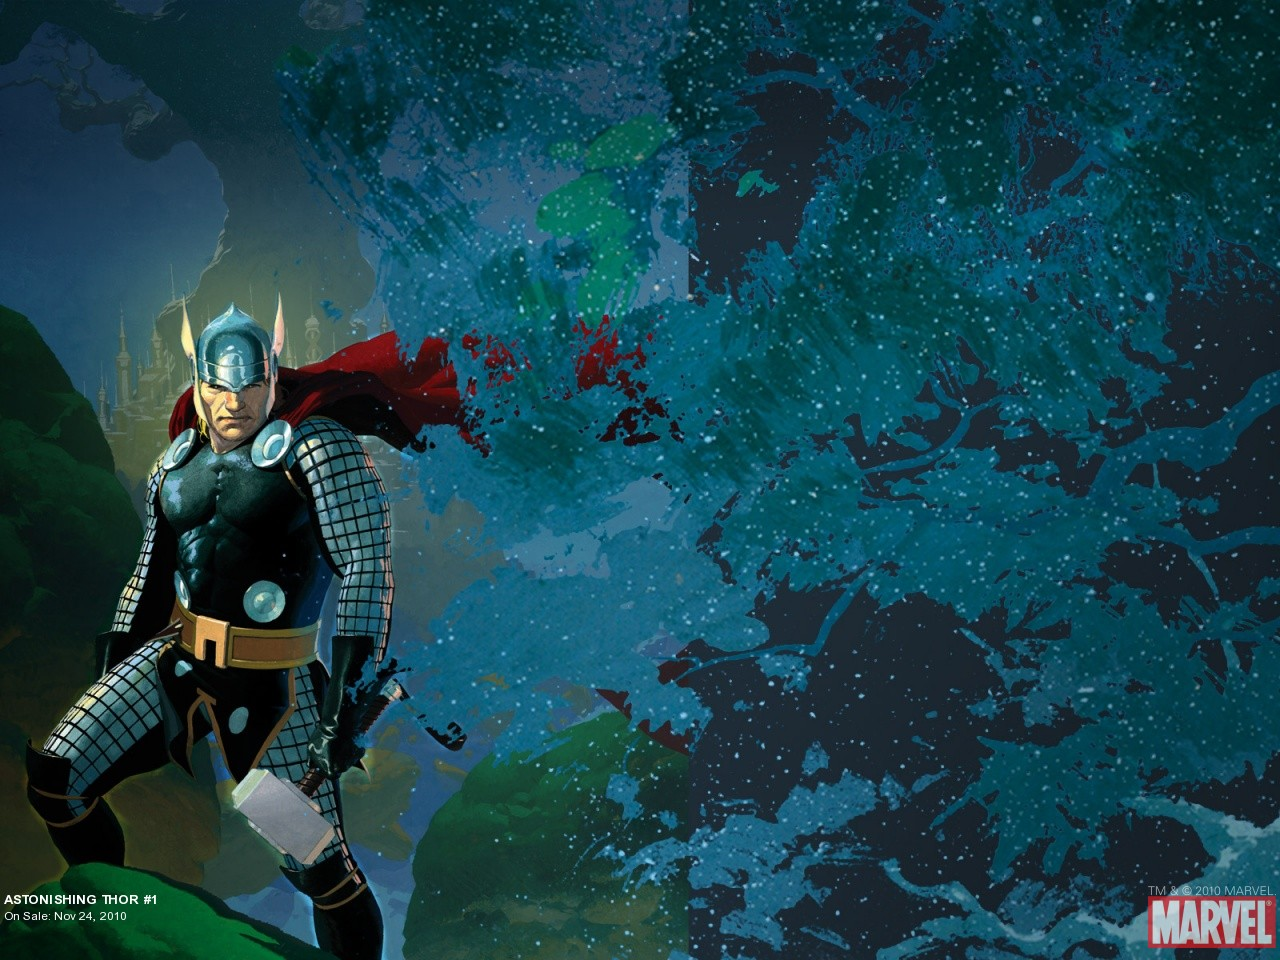 http://2.bp.blogspot.com/-mxuM73ZIYv8/TelR6wo97BI/AAAAAAAAAko/vvf8IDBVUIc/s1600/astonishing+thor+wallpaper_large.jpg